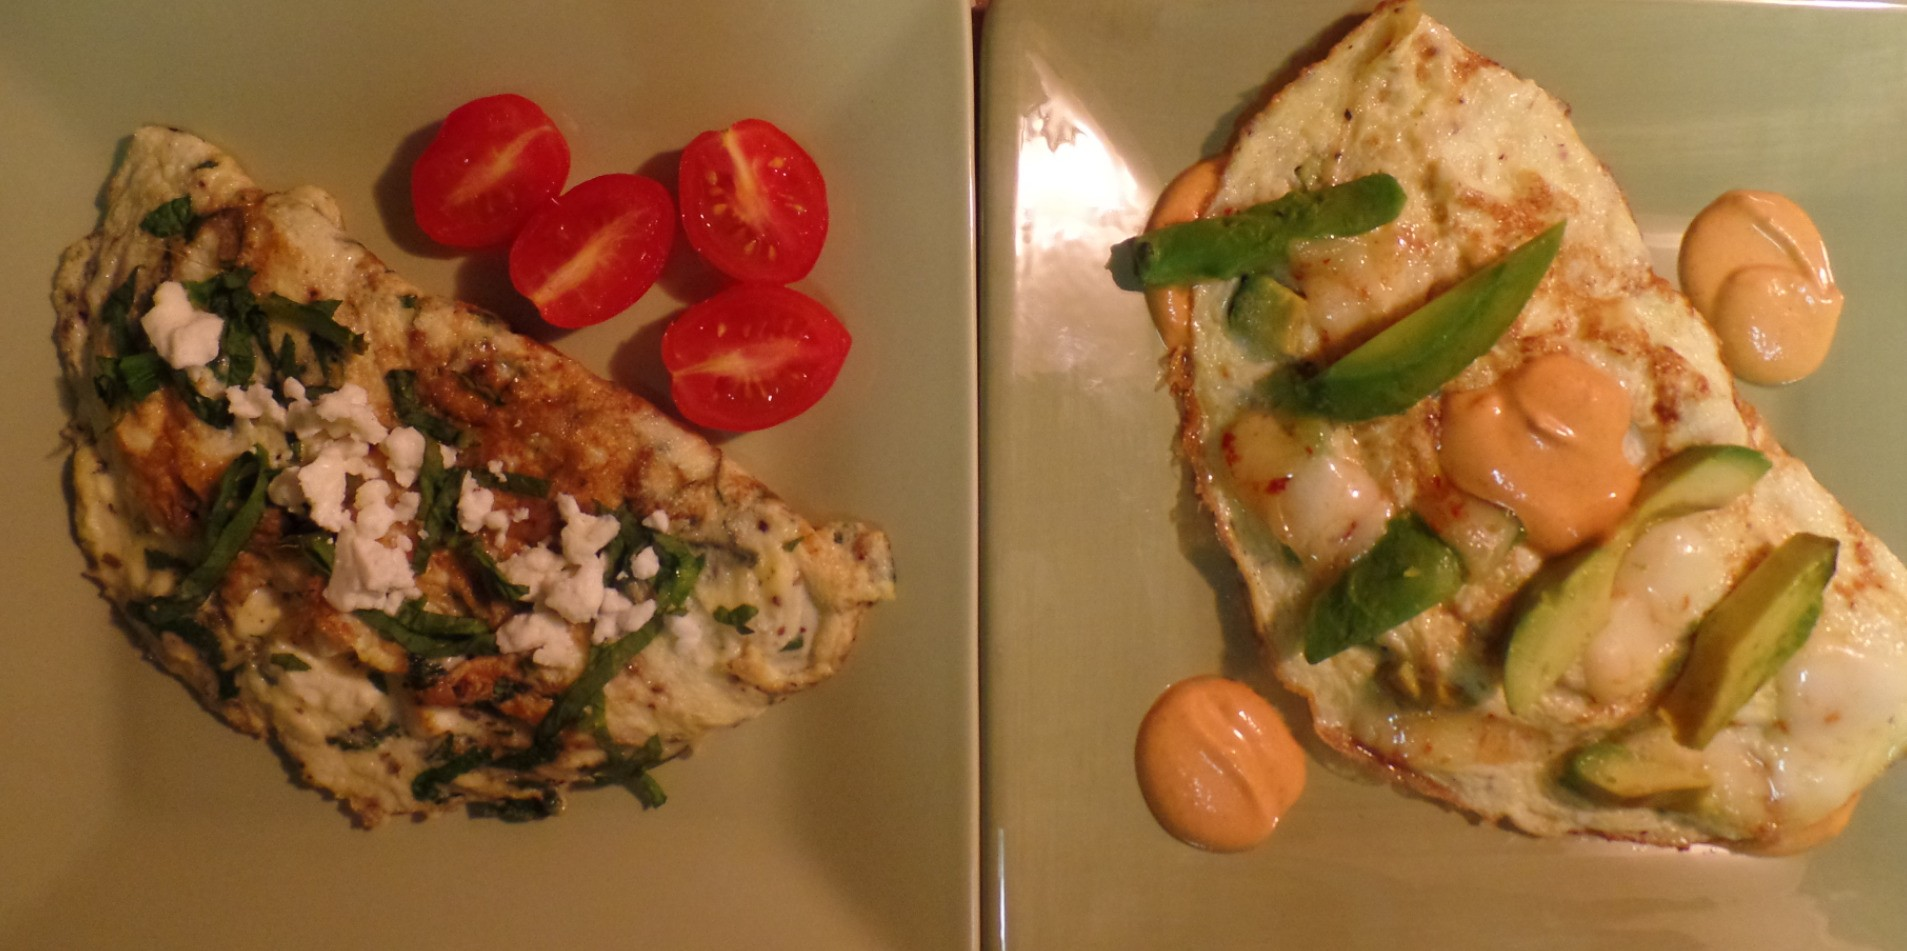 Omeletts for brunch #ilovebrunch #omelette #foodpic #foodgasm #foodporn #foodie #foodpedia #foodhunter #foodbloggers #eatwell #eathealthy #healthyeats #healthyfood #healthyeating #healthyfoods #realfood #detroitfoodnetwork #detroitfoodie #detroitfoodies #detroitfood #delish #delicious #deliciousfood #deliciousfoods #deliciousness #instafood #foodnetwork #owntv #wholefoods